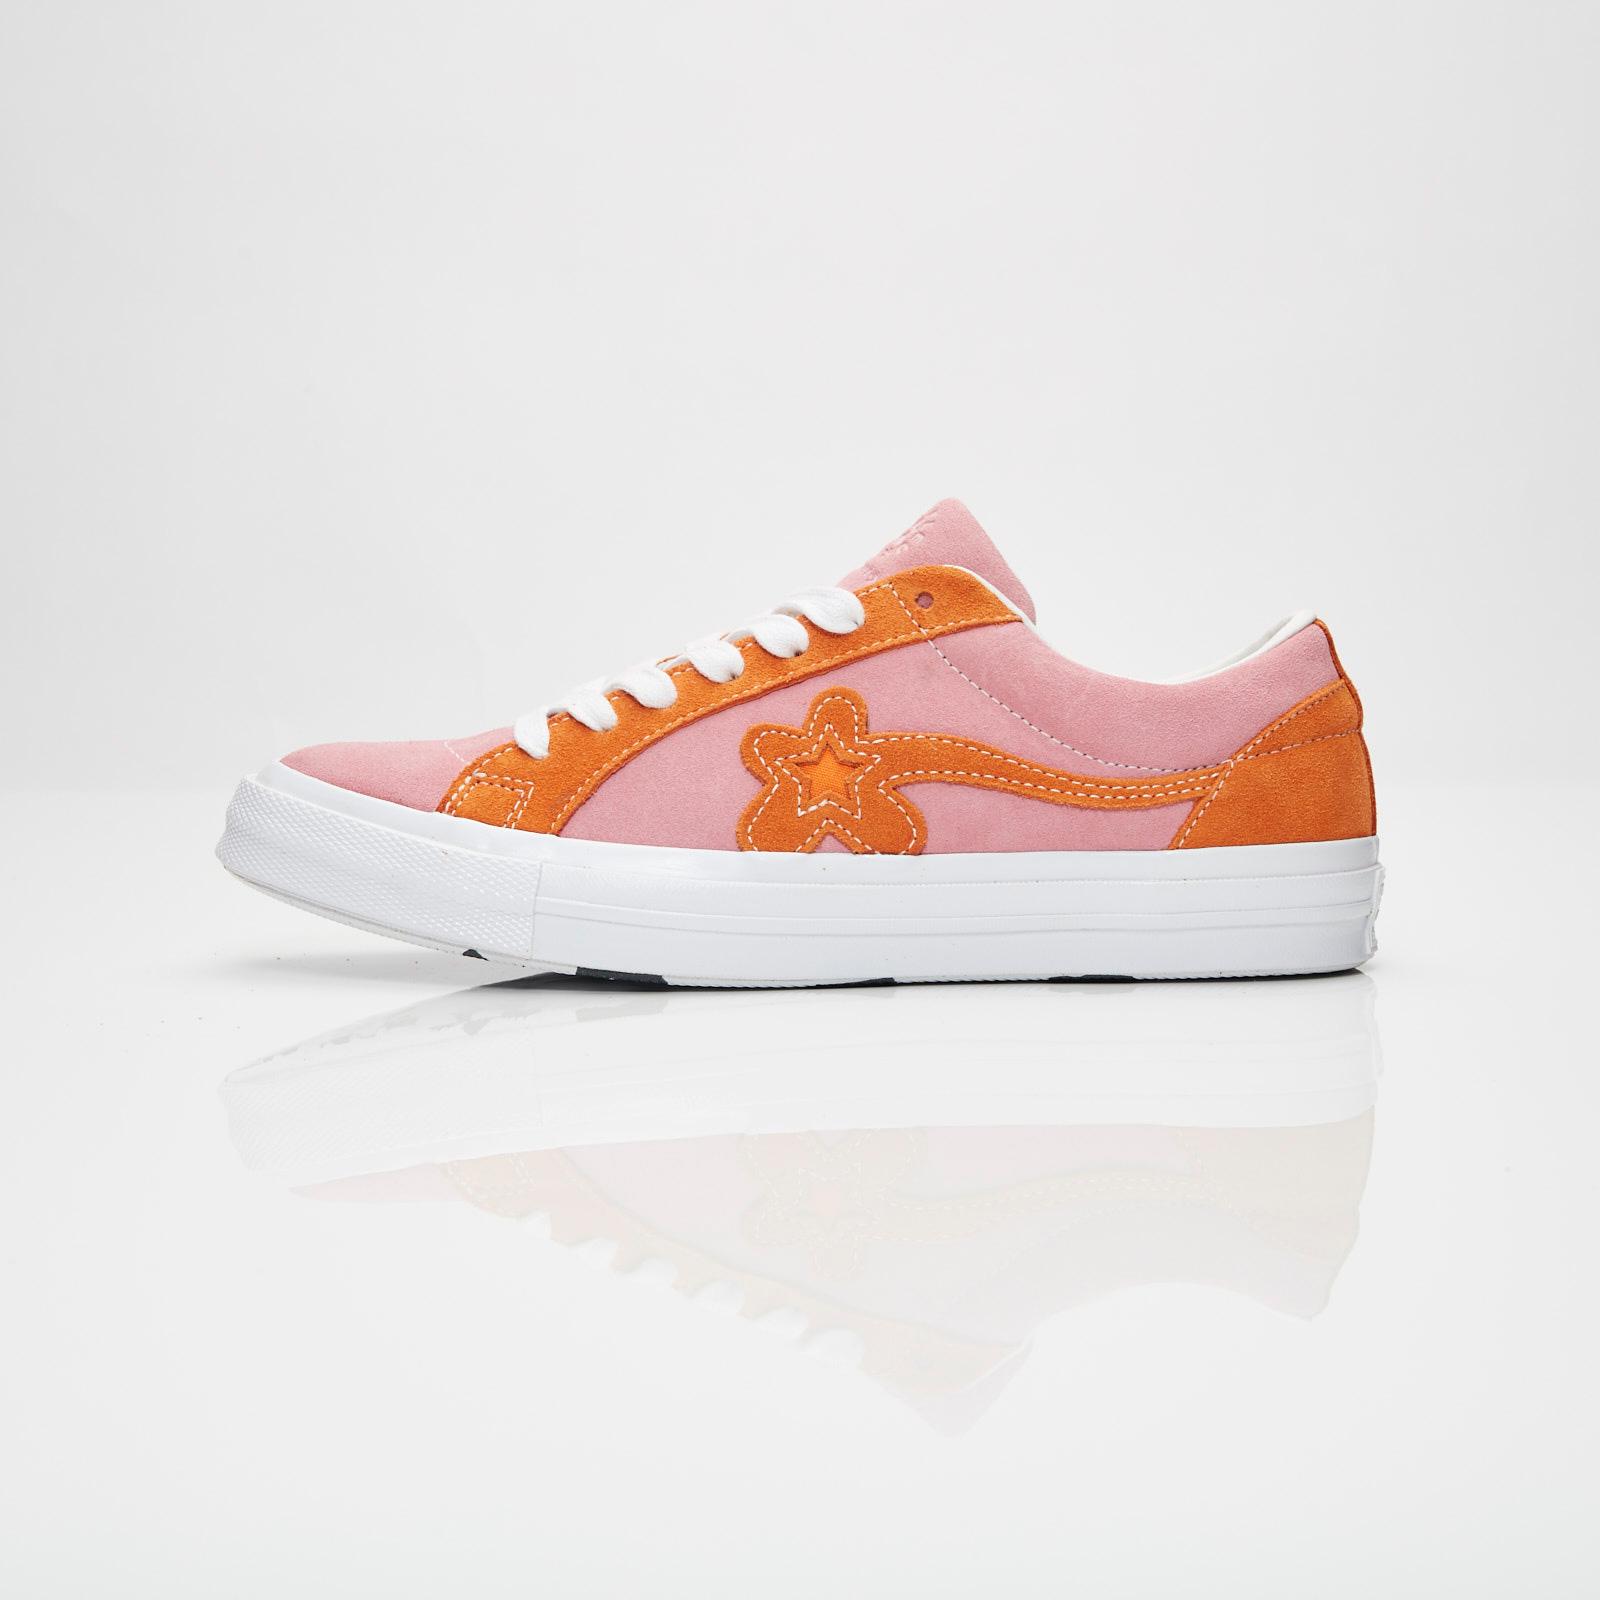 47151c00ee6 Converse One Star x Golf Le Fleur - 162125c - Sneakersnstuff ...